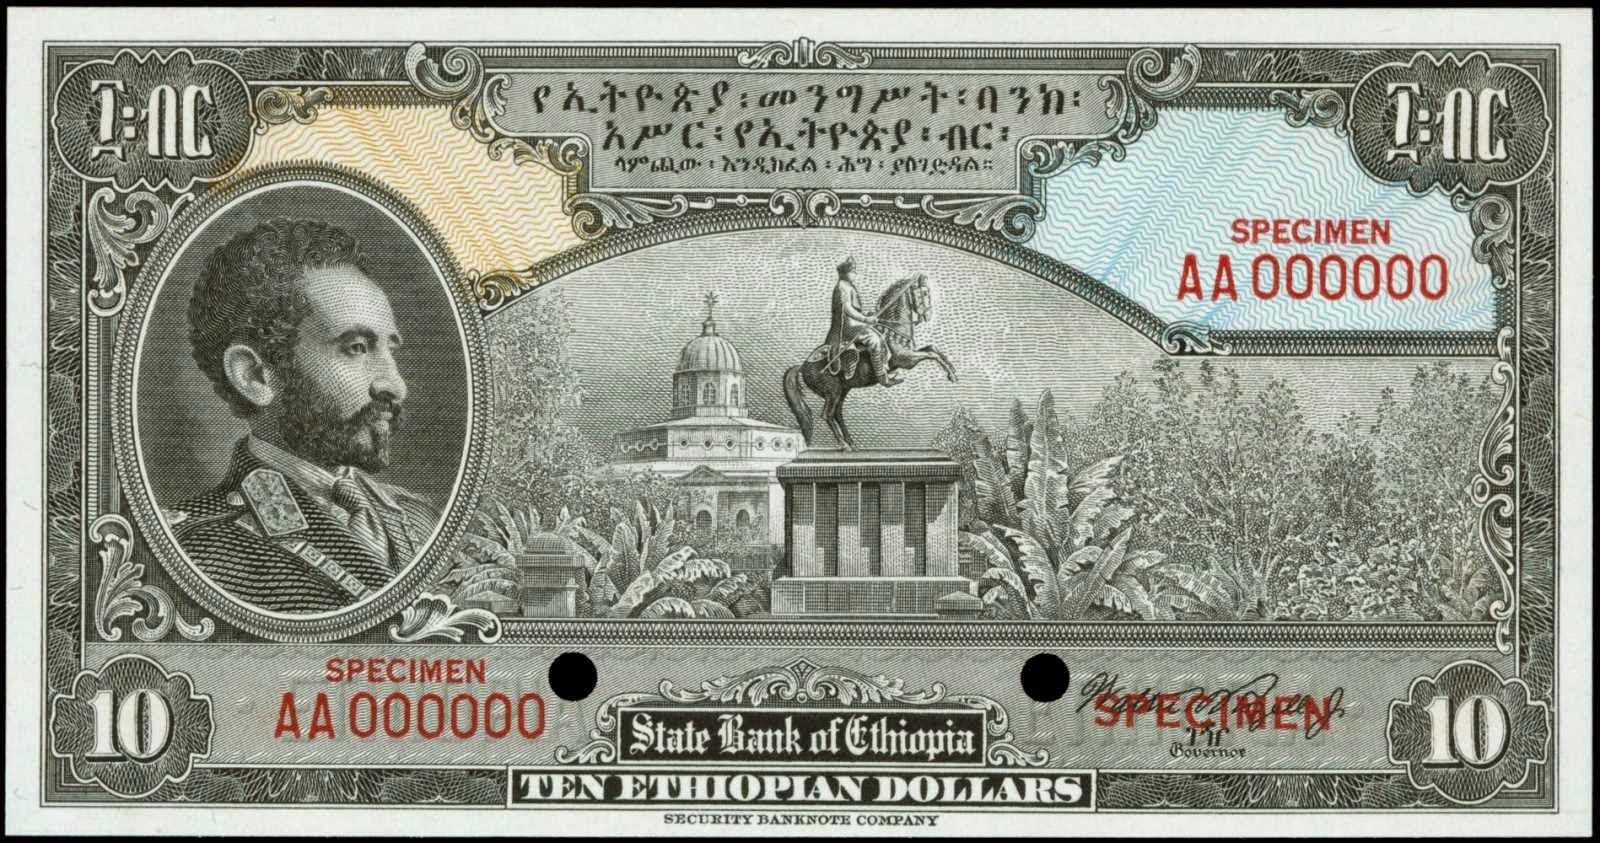 Ethiopia banknotes 10 Dollars note 1945 Emperor Haile Selassie